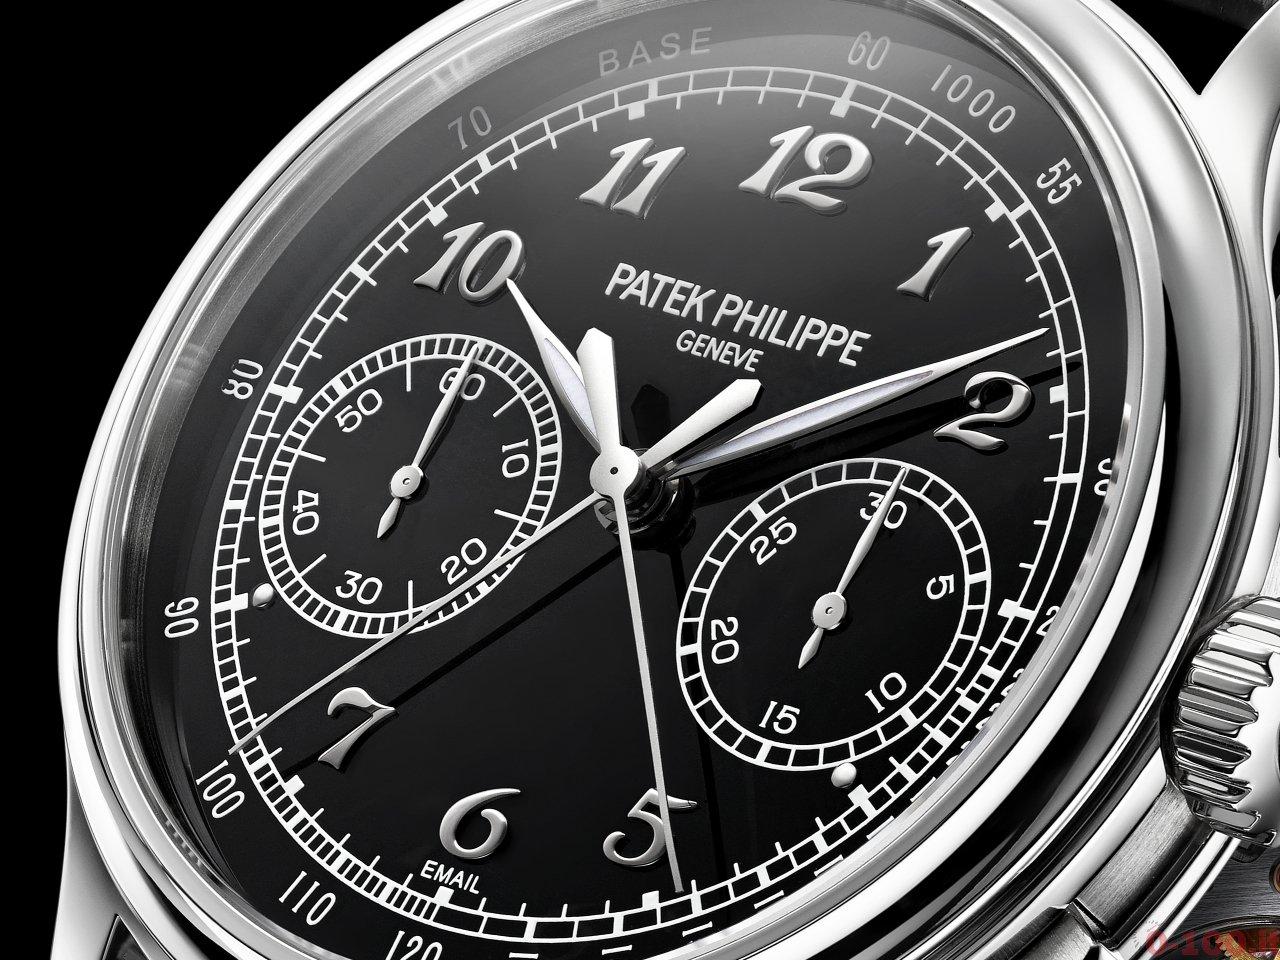 baselworld-2015-patek-philippe-cronografo-rattrappante-0-100_5